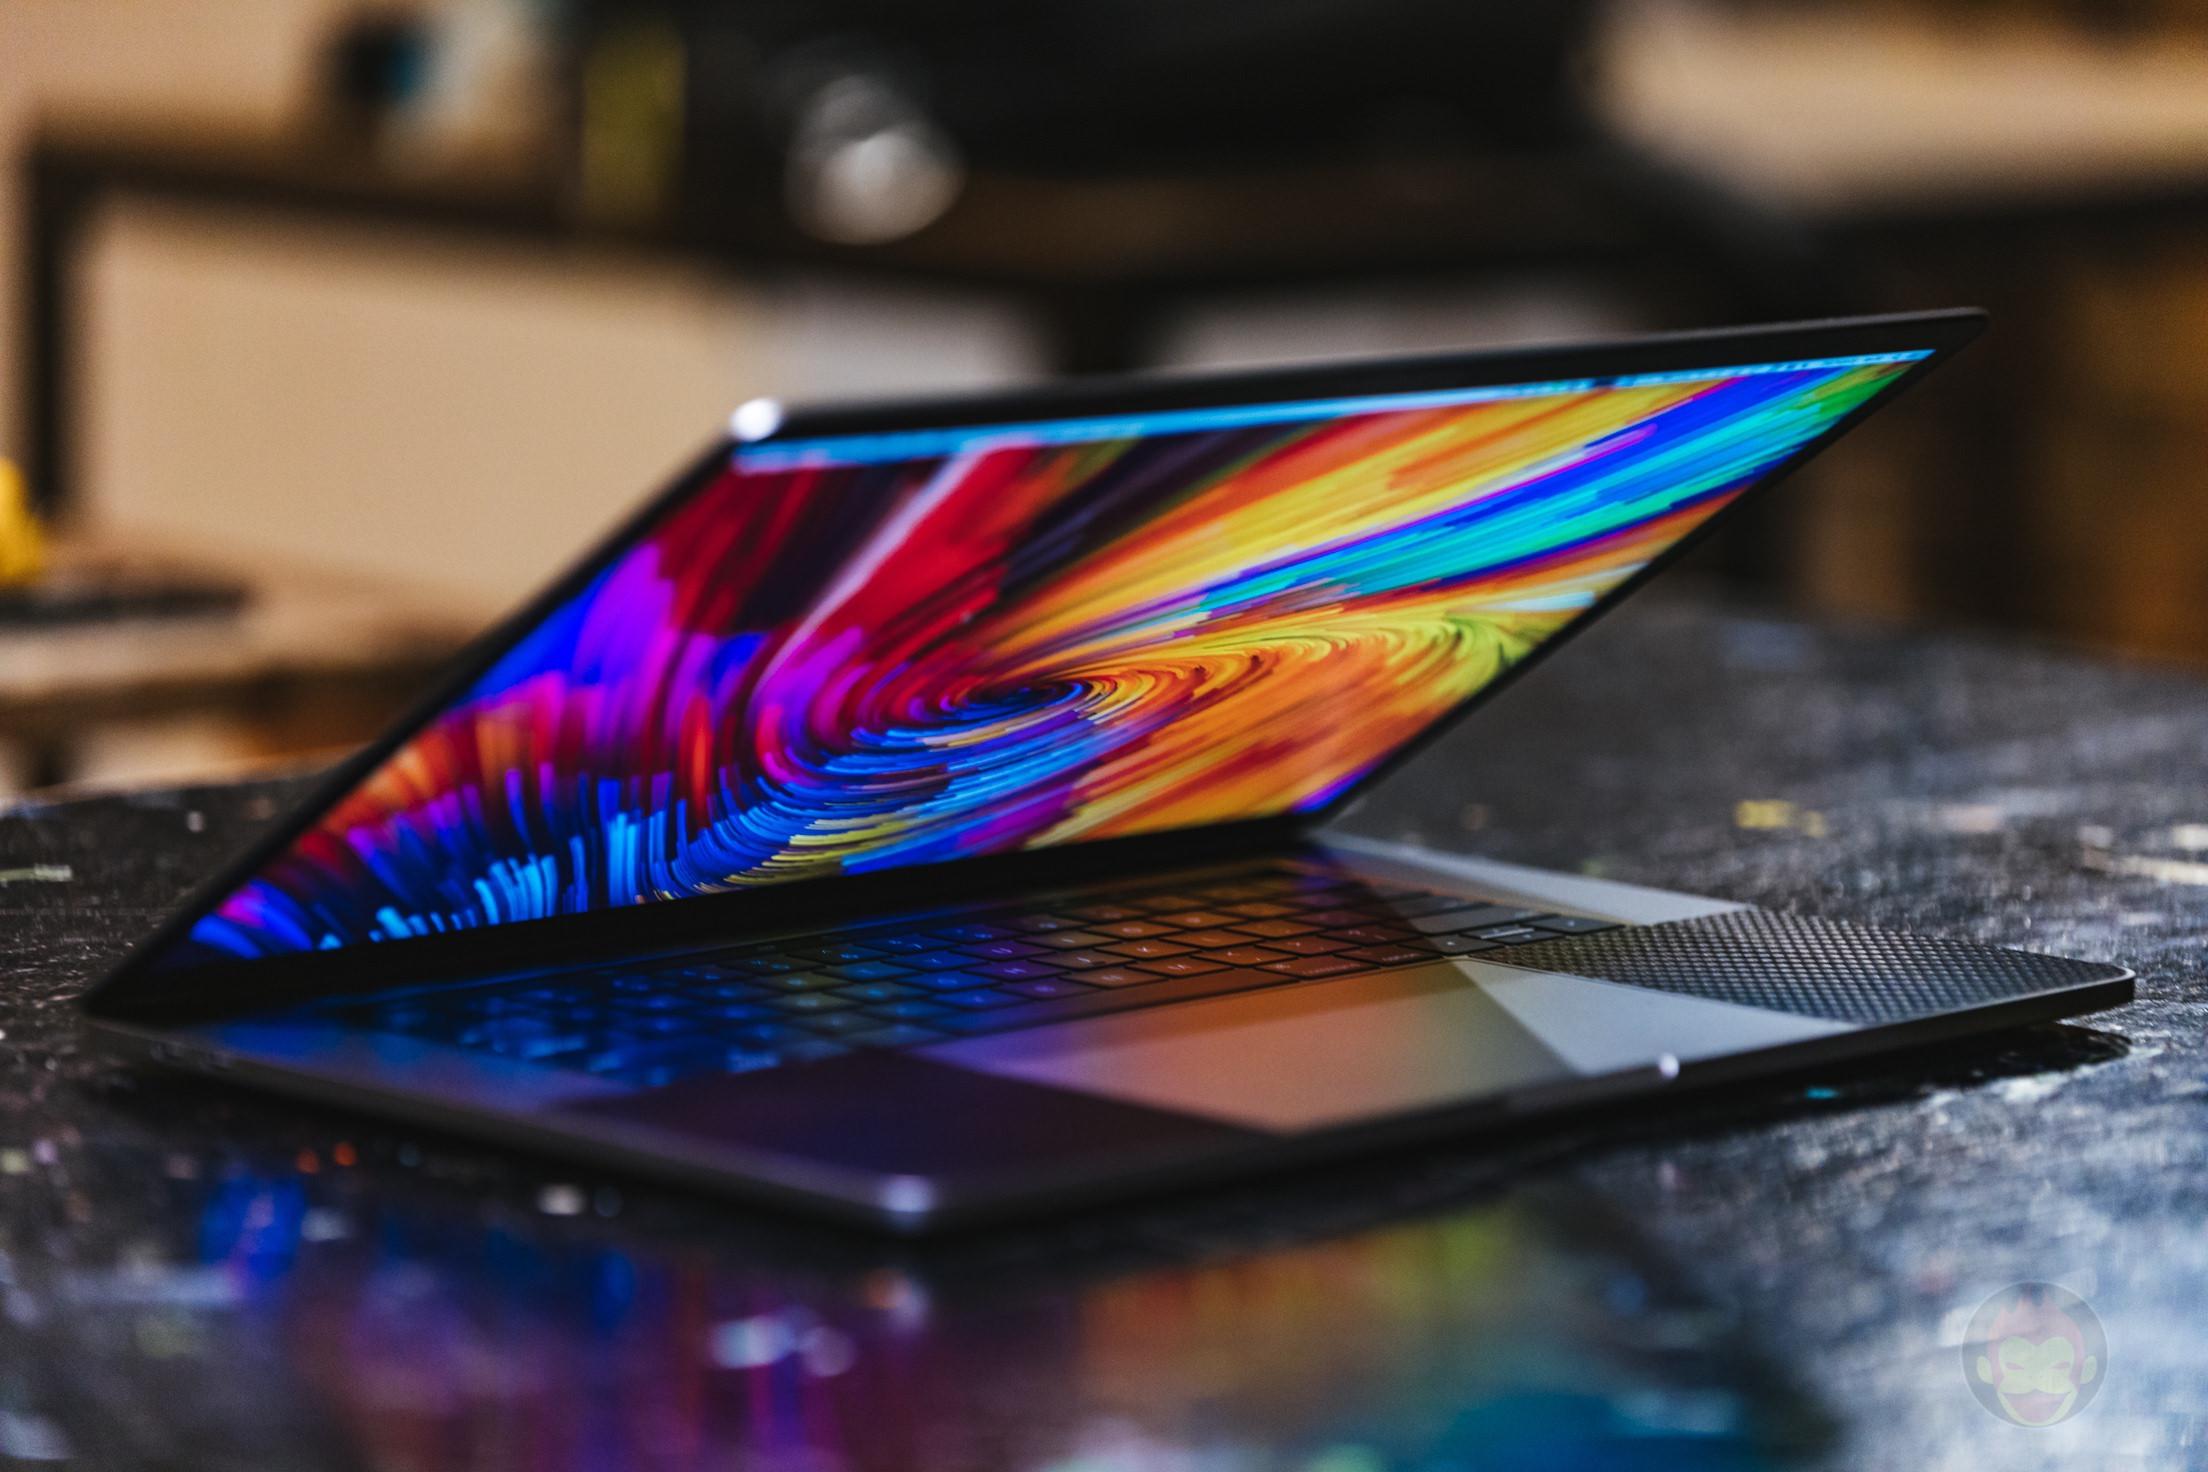 MacBook-Pro-2019-15inch-review-25.jpg